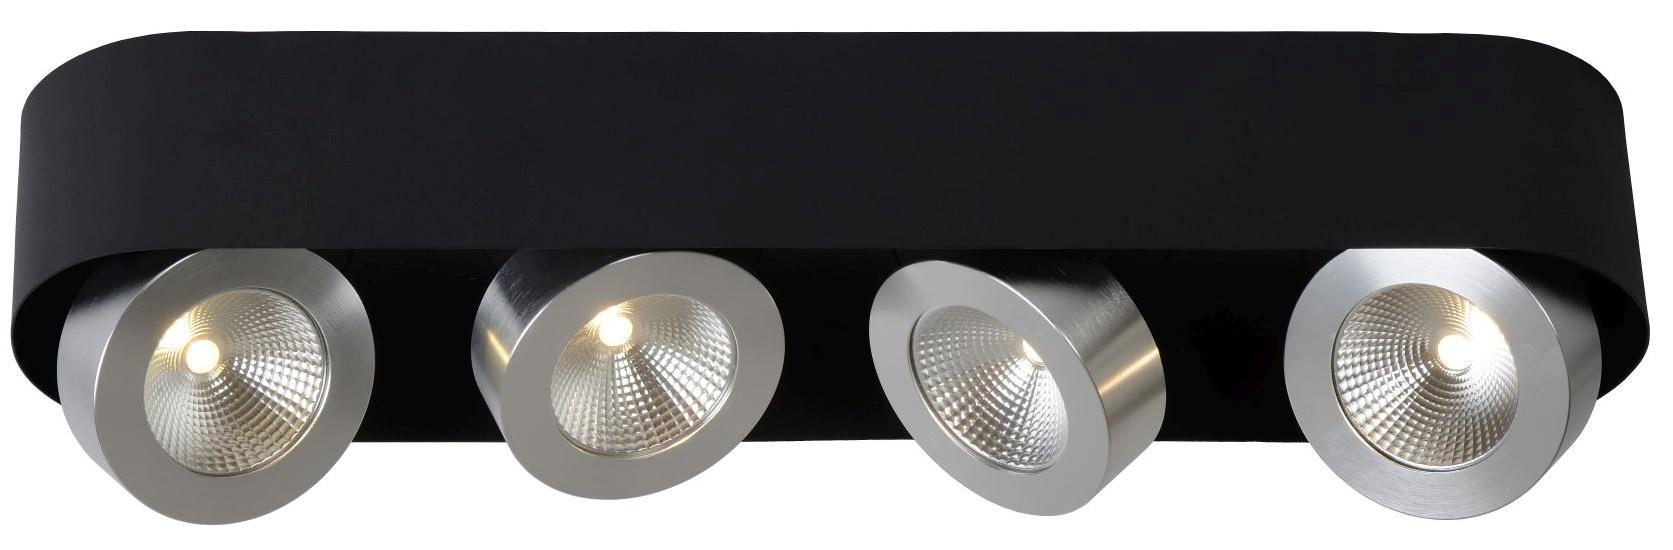 Lucide Plafondspot Radus 4 Lichts - Dimbare LED 5W - Zwart